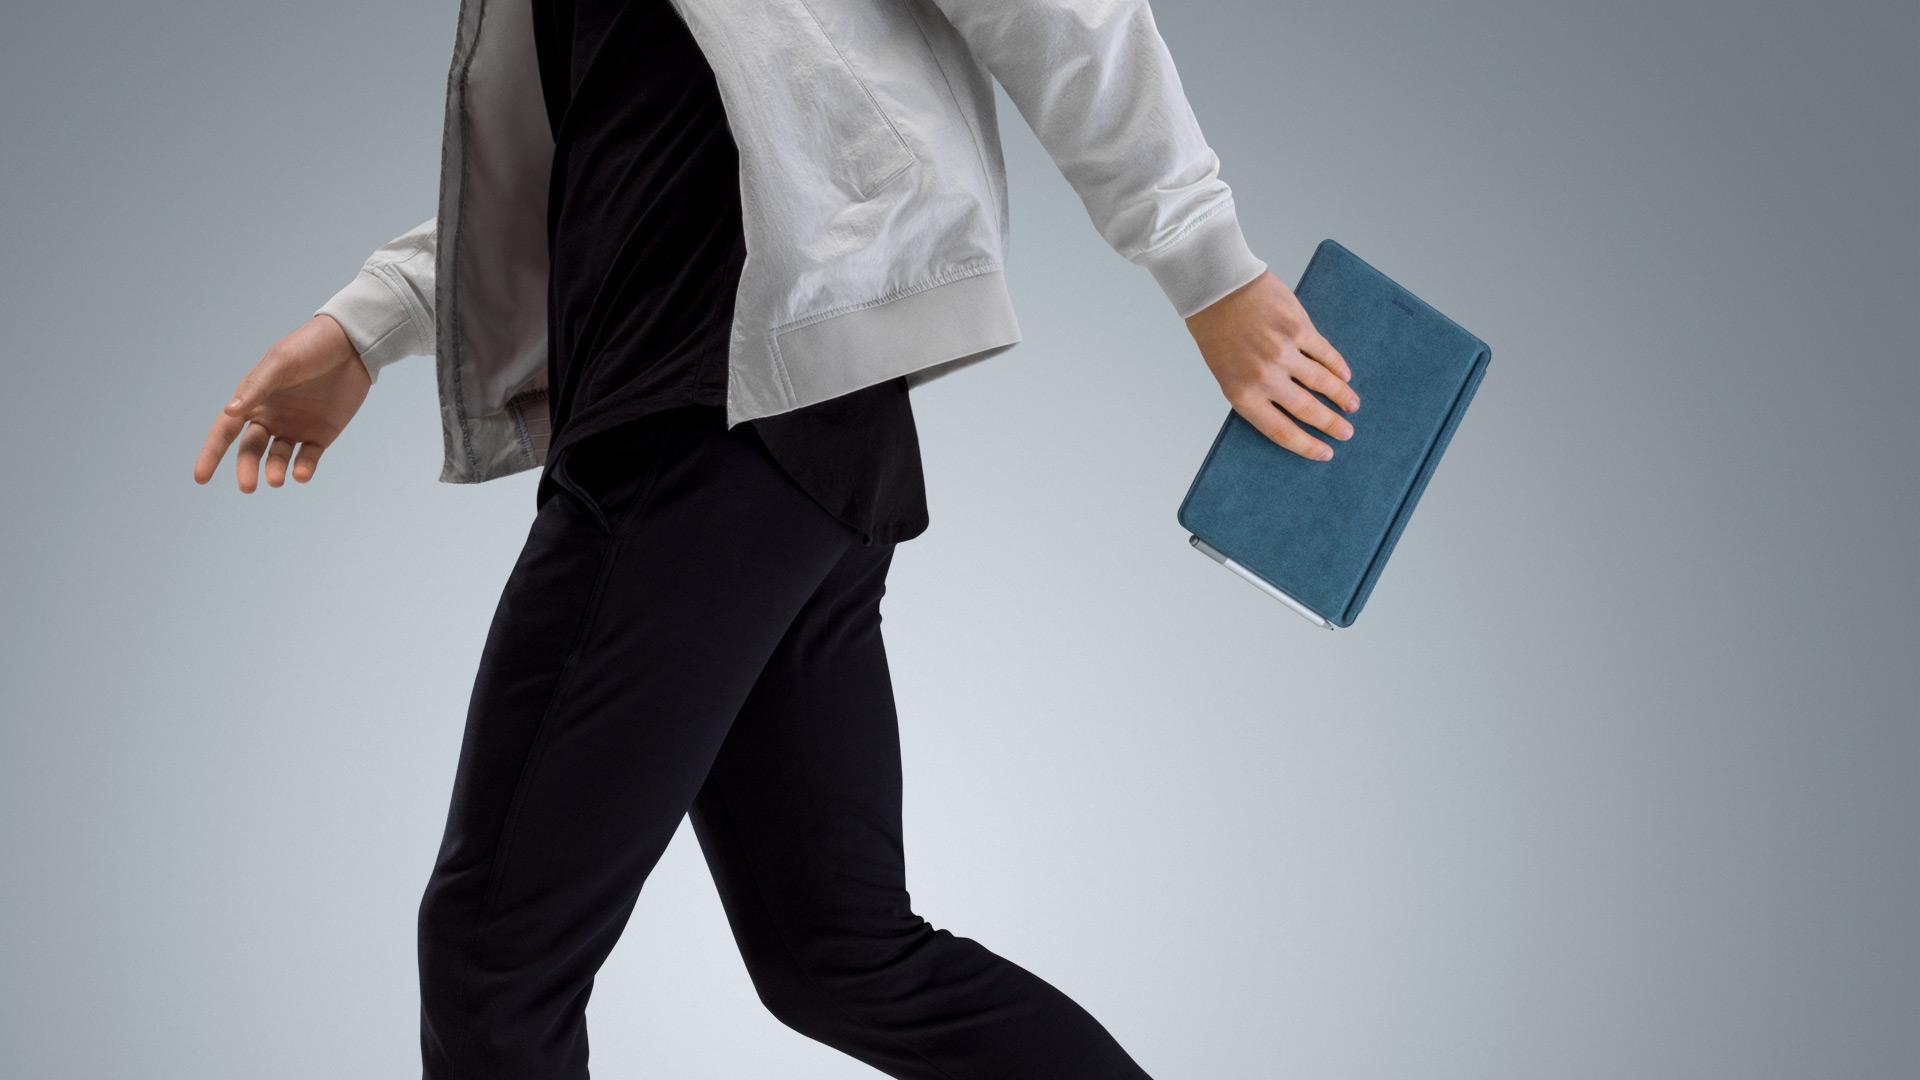 一位行走的男士带着配备蓝色 Surface Go Signature Type Cover 的 Surface Go